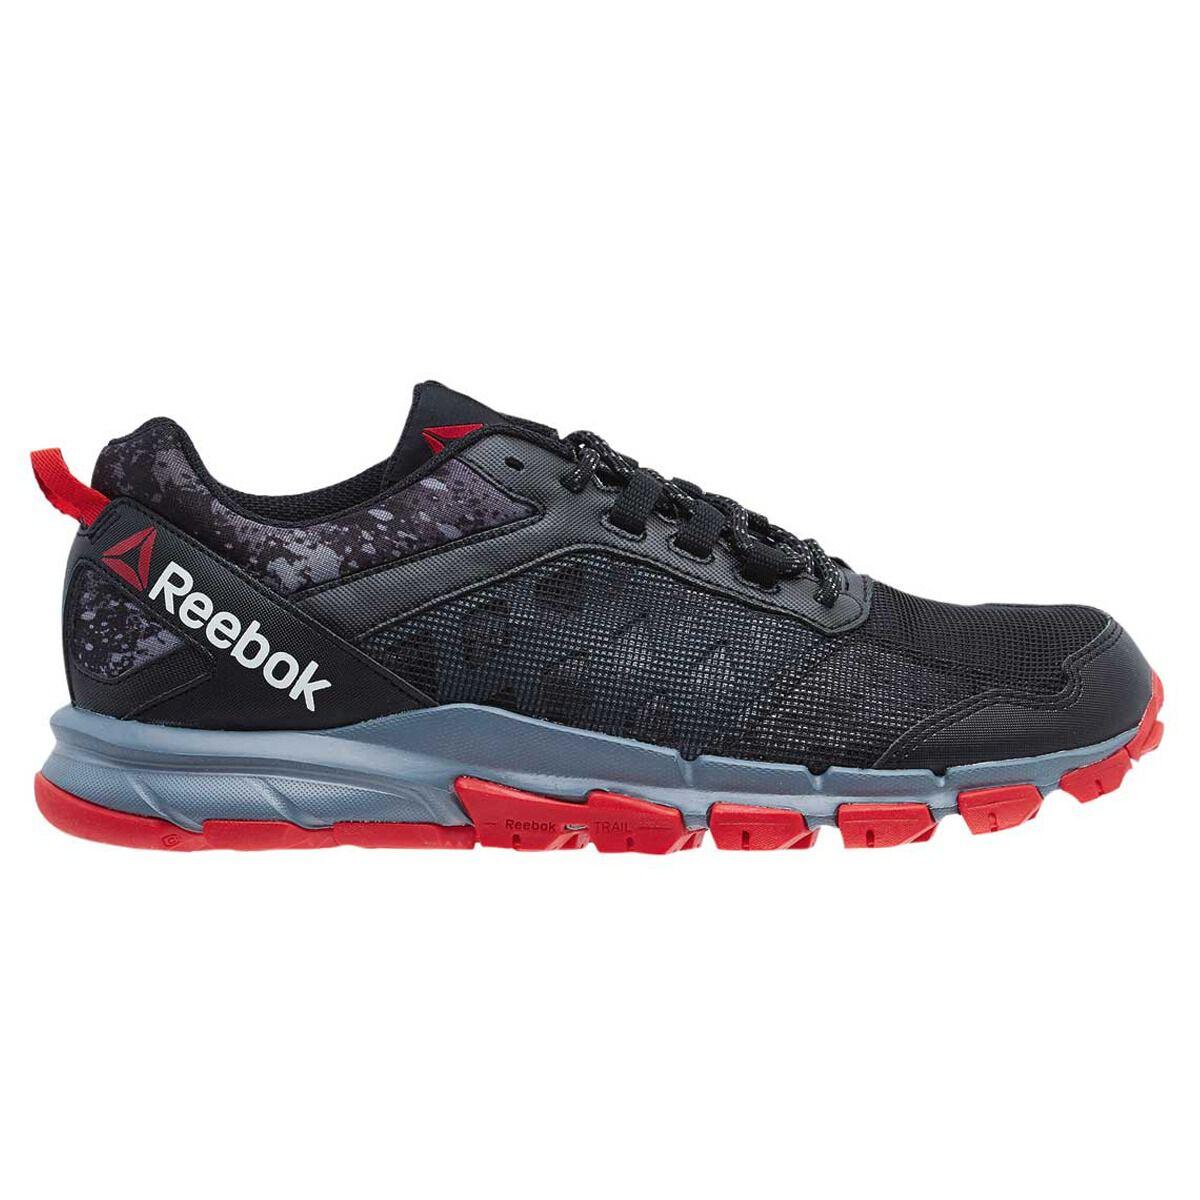 Mens Trail Reebok Sport ShoesRebel Running Warrior Py8nON0wvm